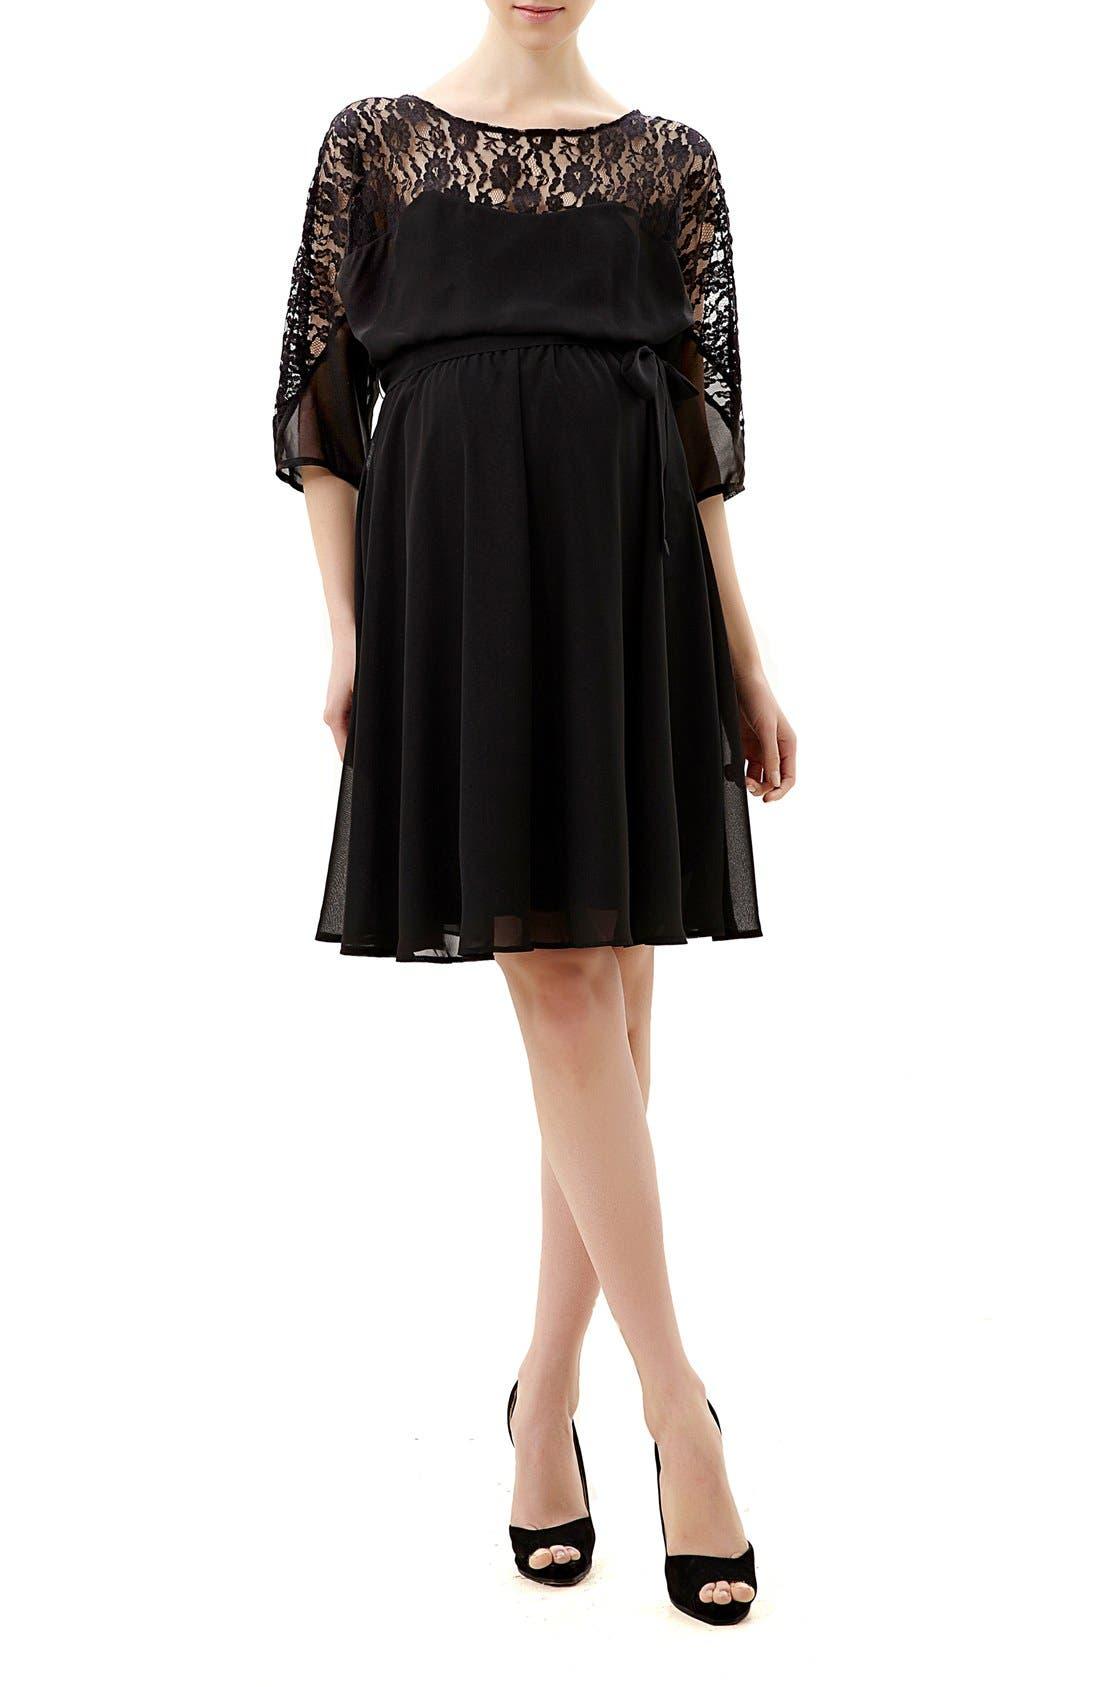 Main Image - Kimi and Kai Piper Lace Maternity Dress